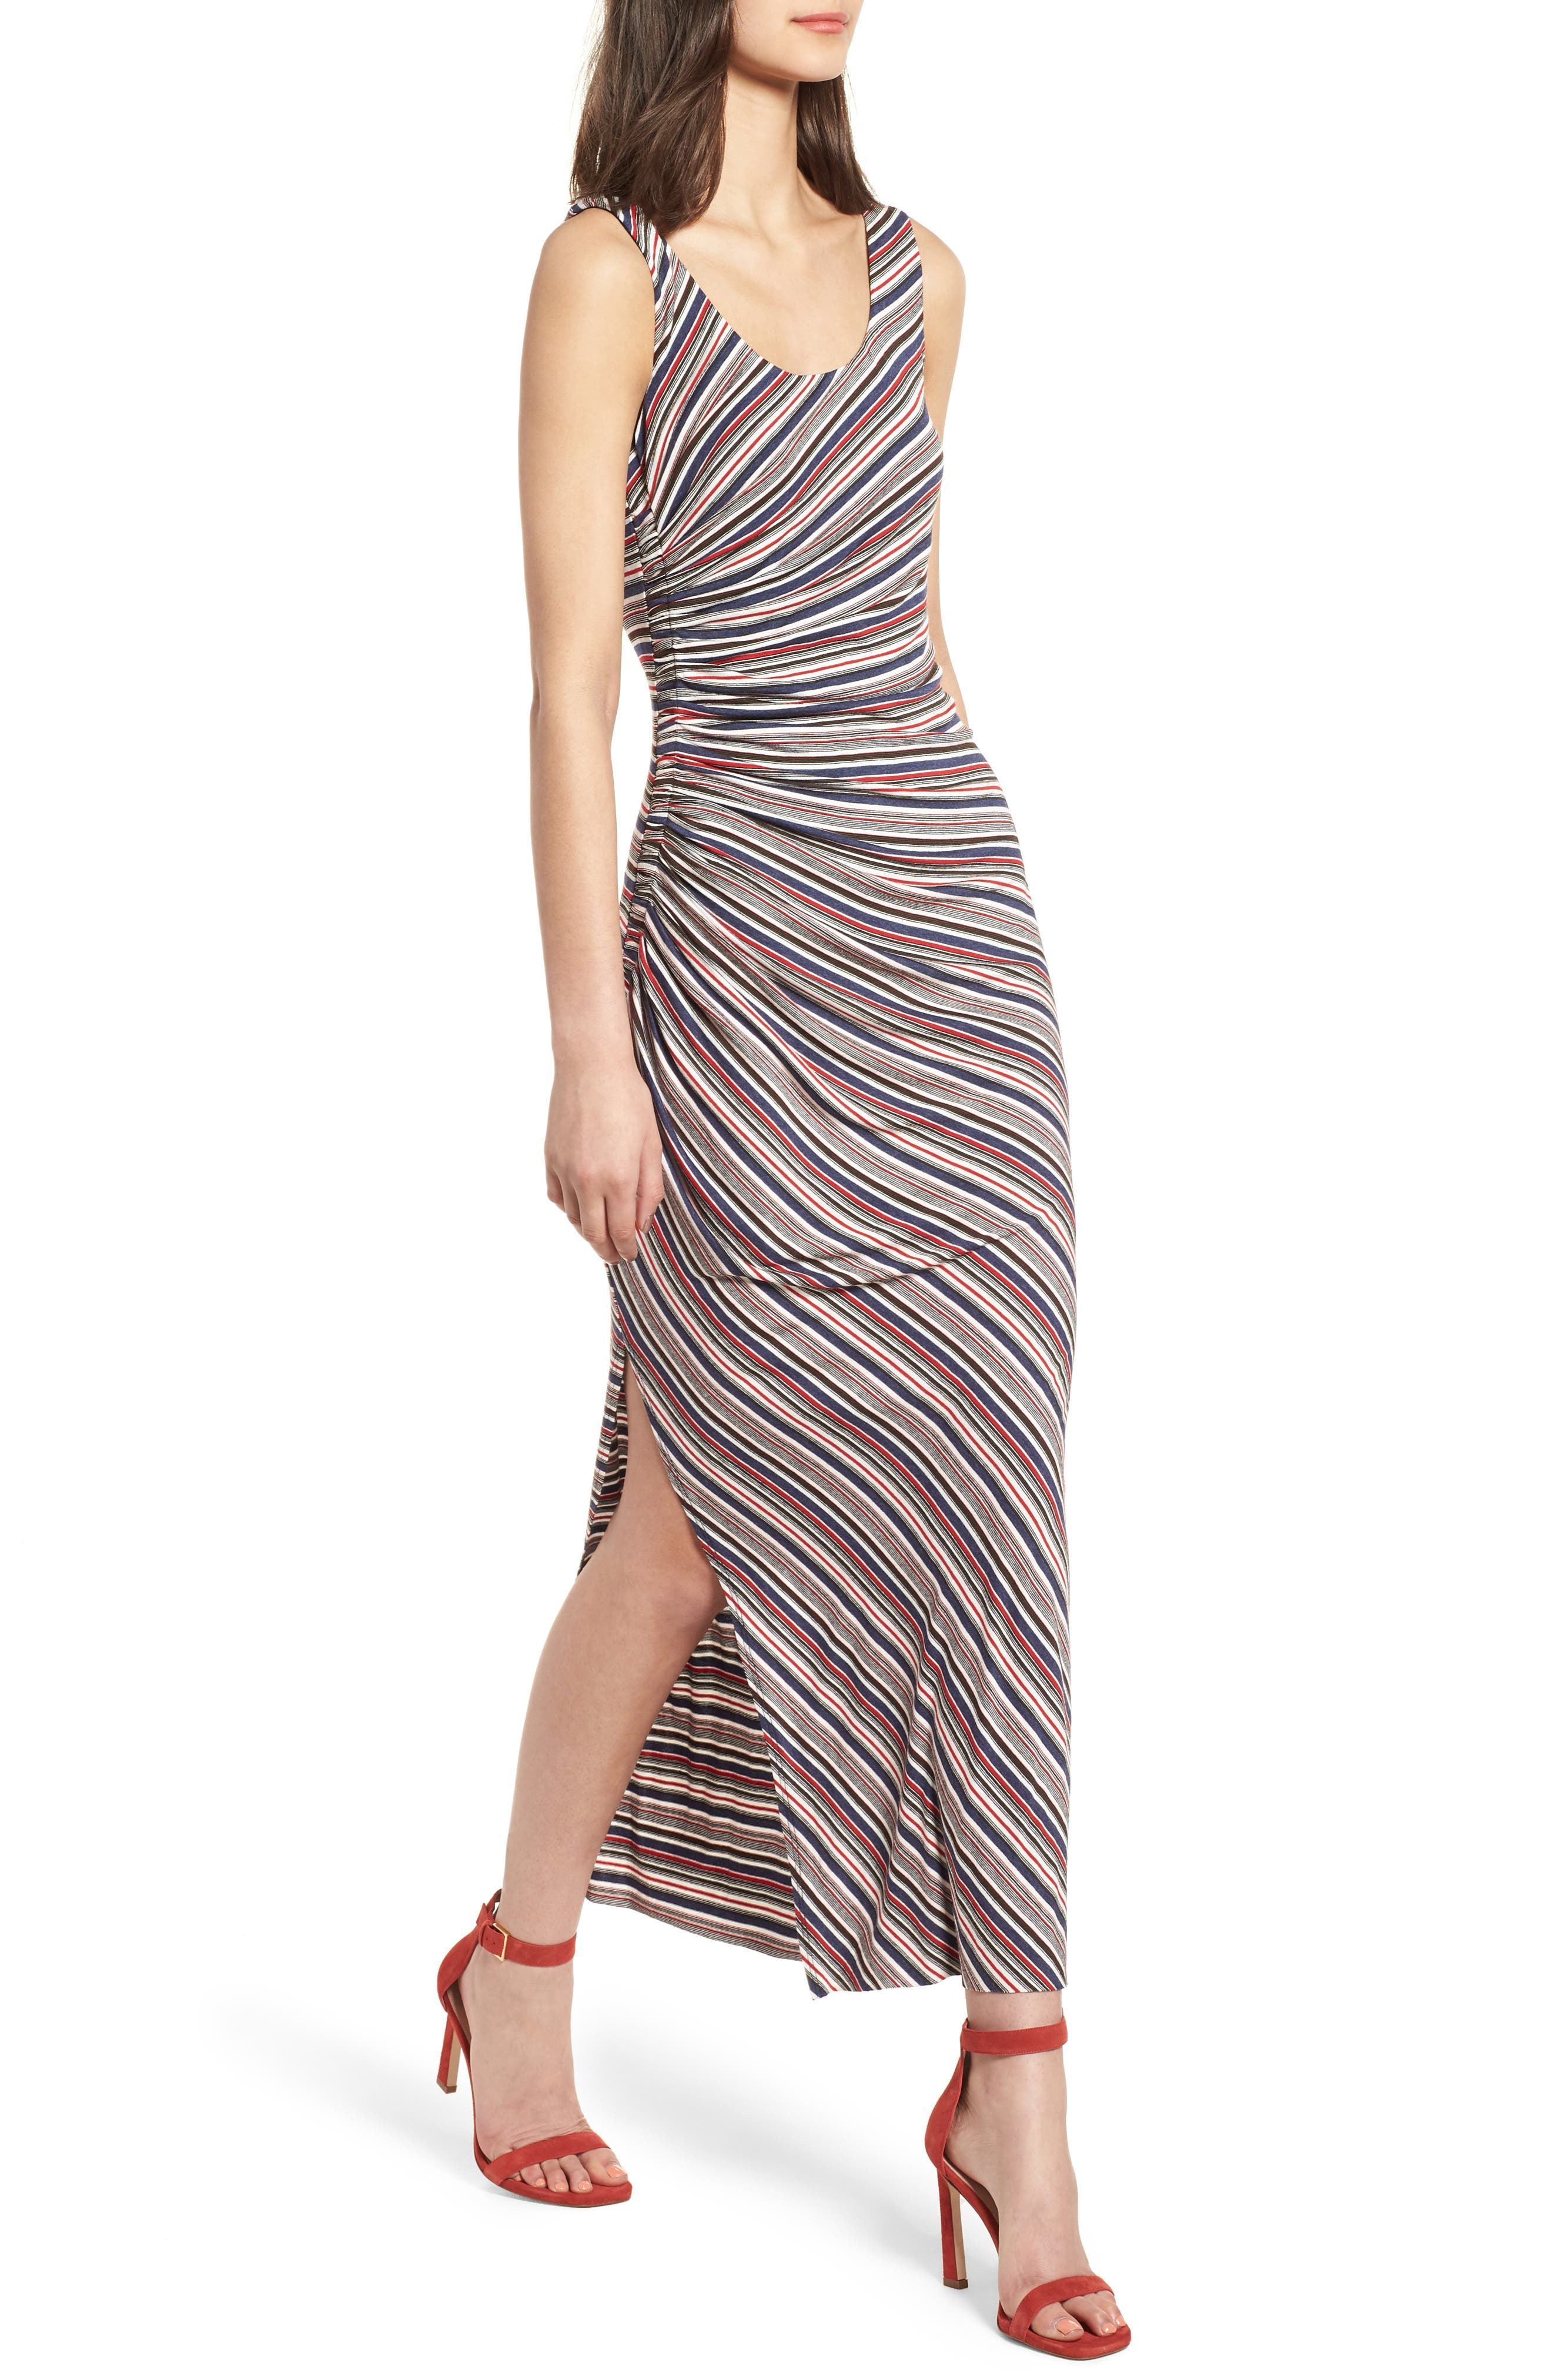 Duststorm Stripe Maxi Tank Dress,                         Main,                         color, Multi Stripe